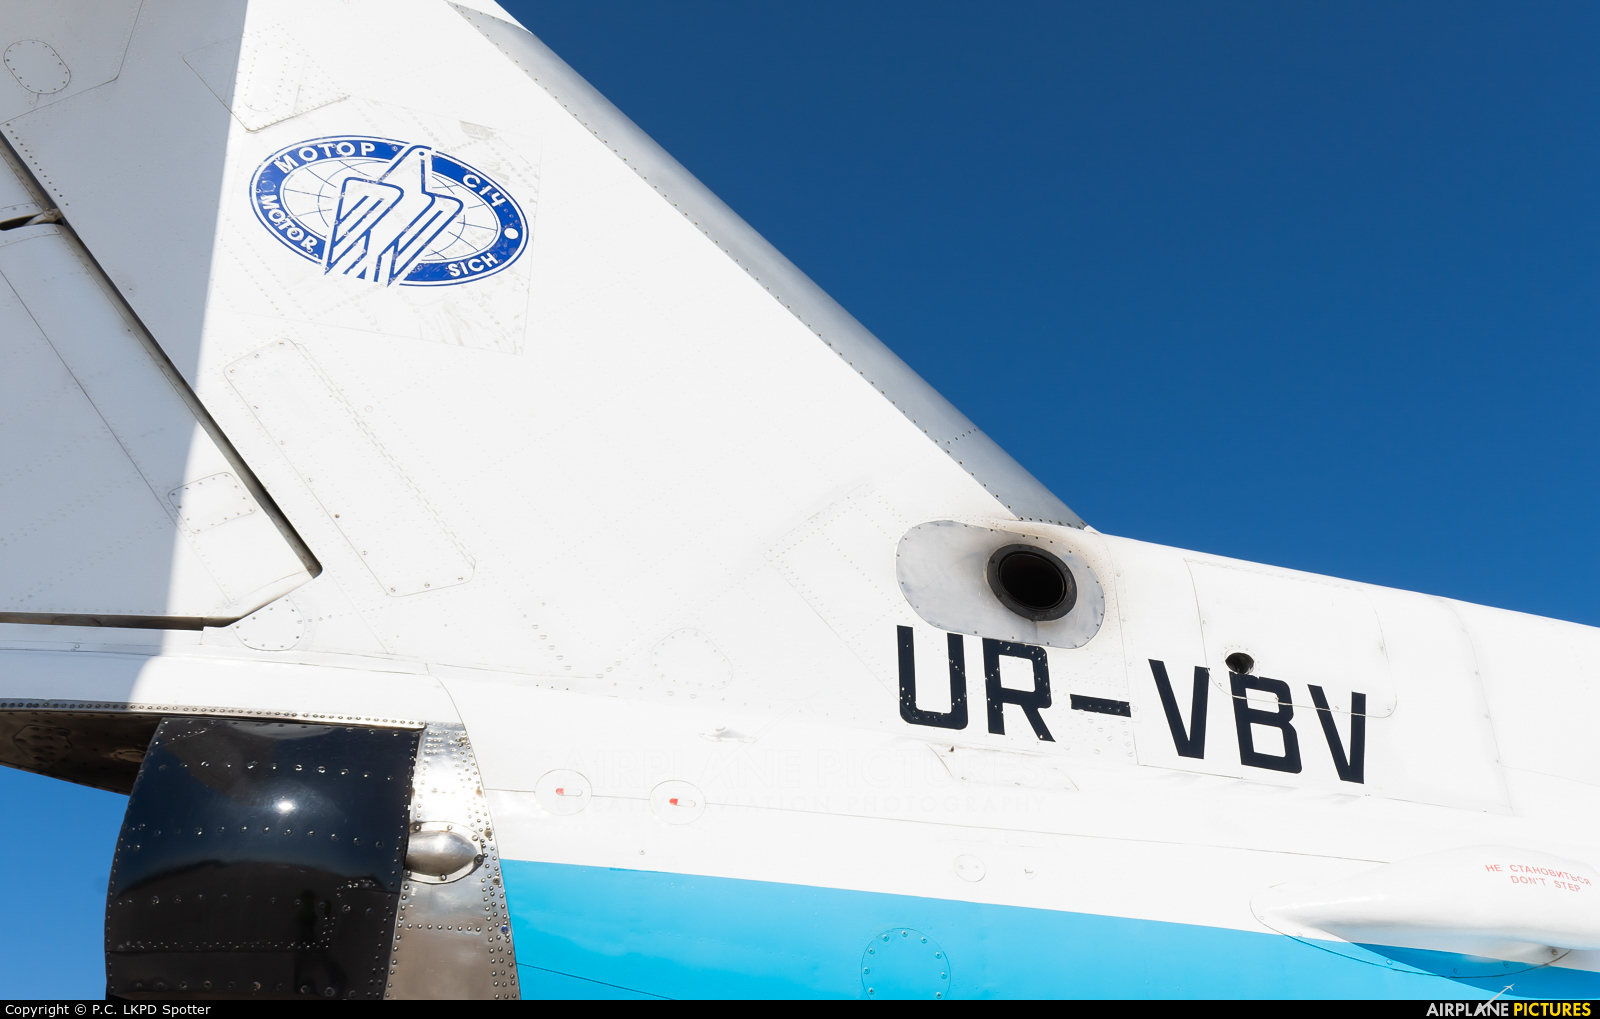 Motor Sich UR-VBV aircraft at Pardubice